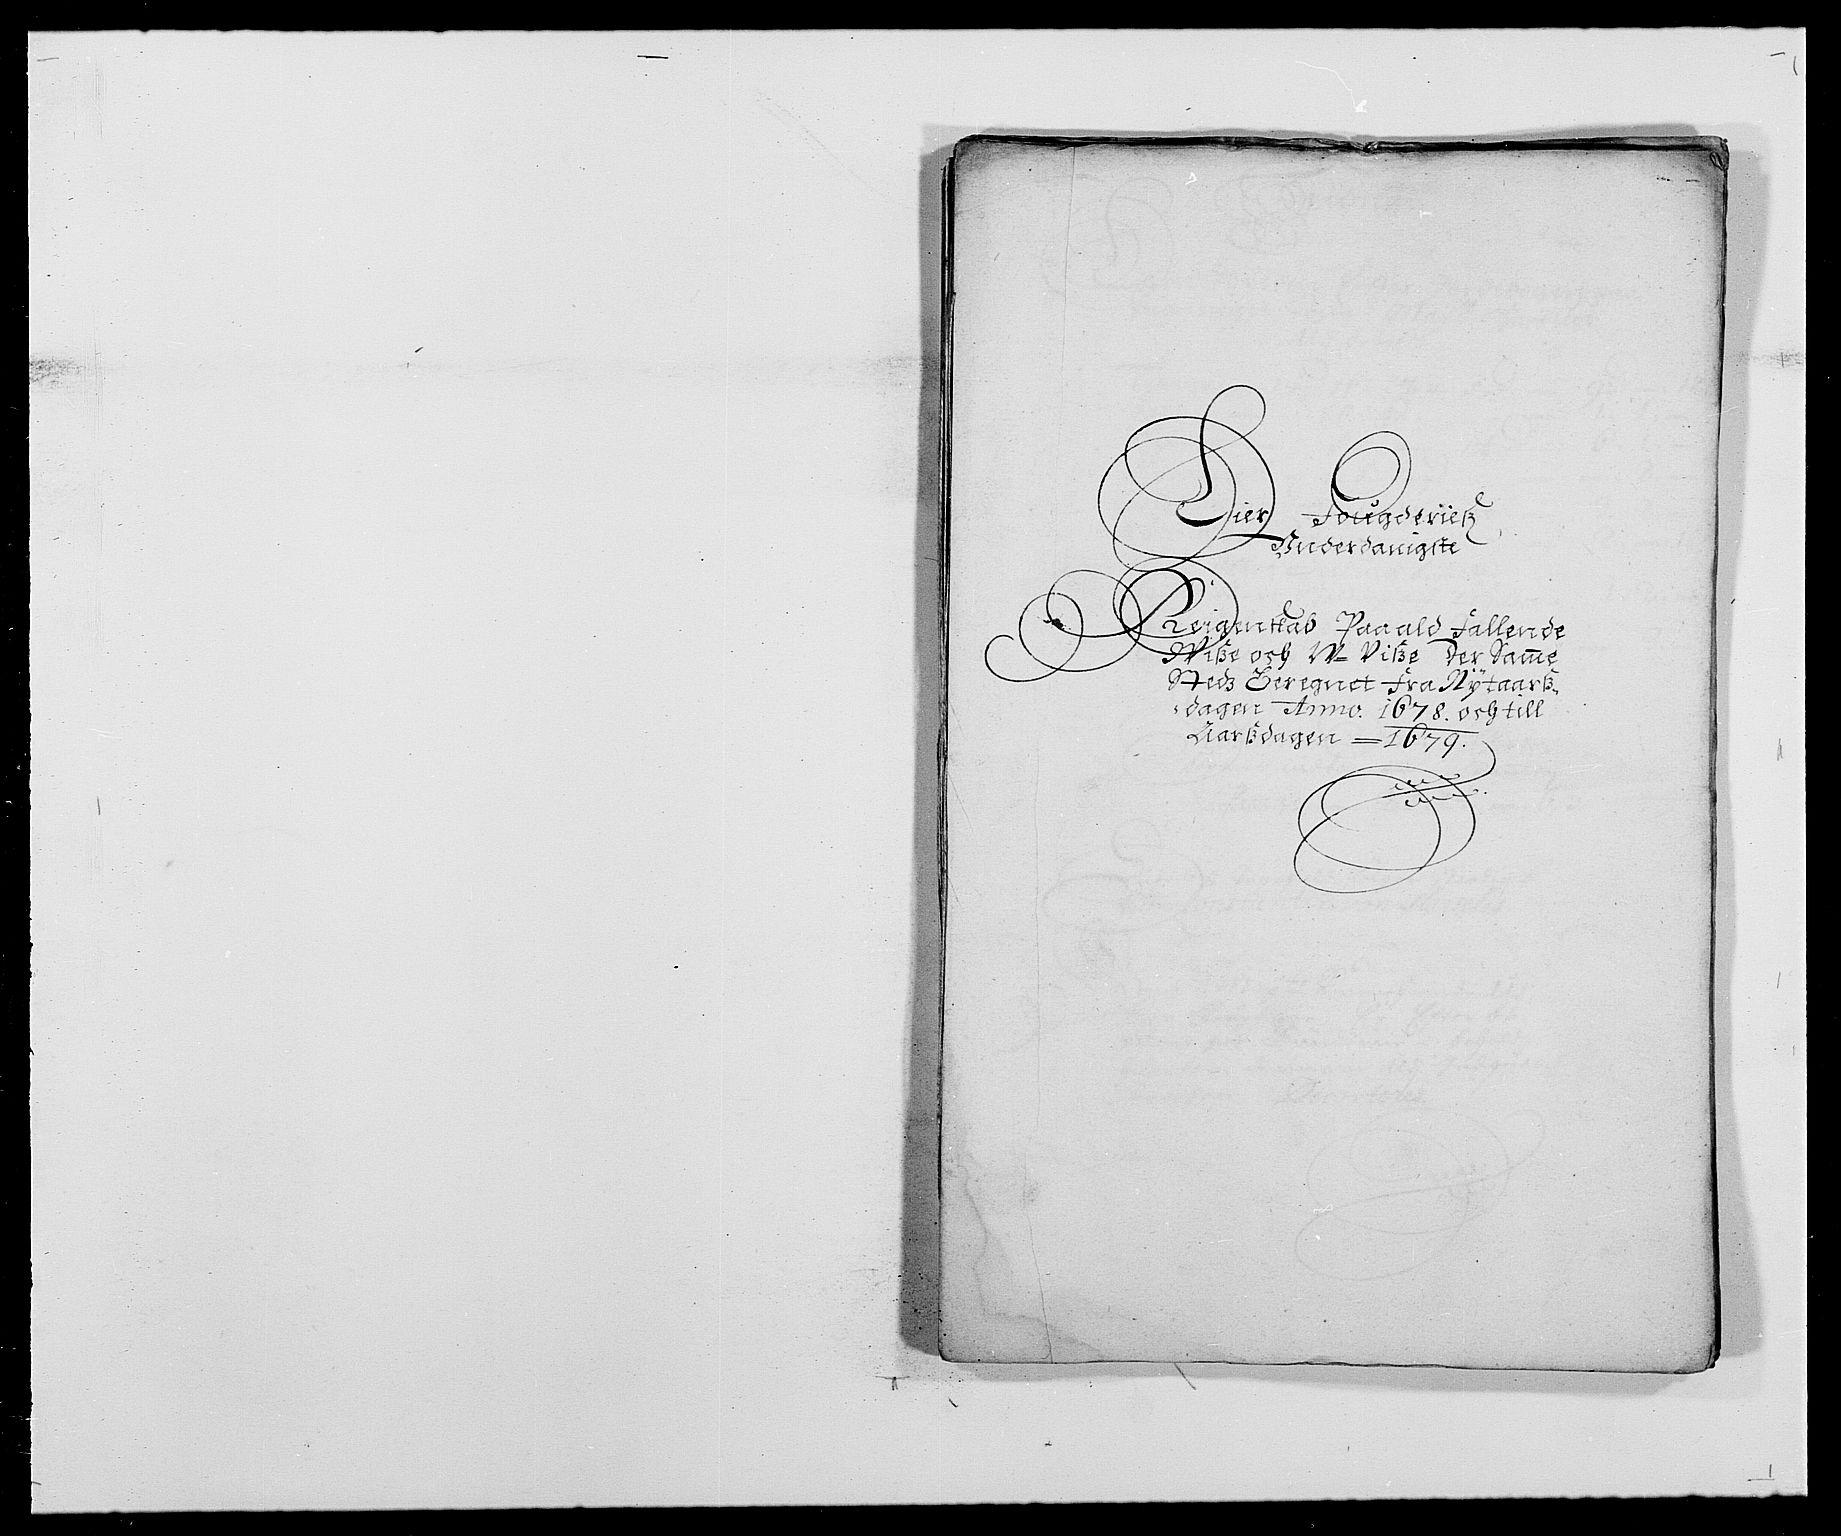 RA, Rentekammeret inntil 1814, Reviderte regnskaper, Fogderegnskap, R27/L1687: Fogderegnskap Lier, 1678-1686, s. 303